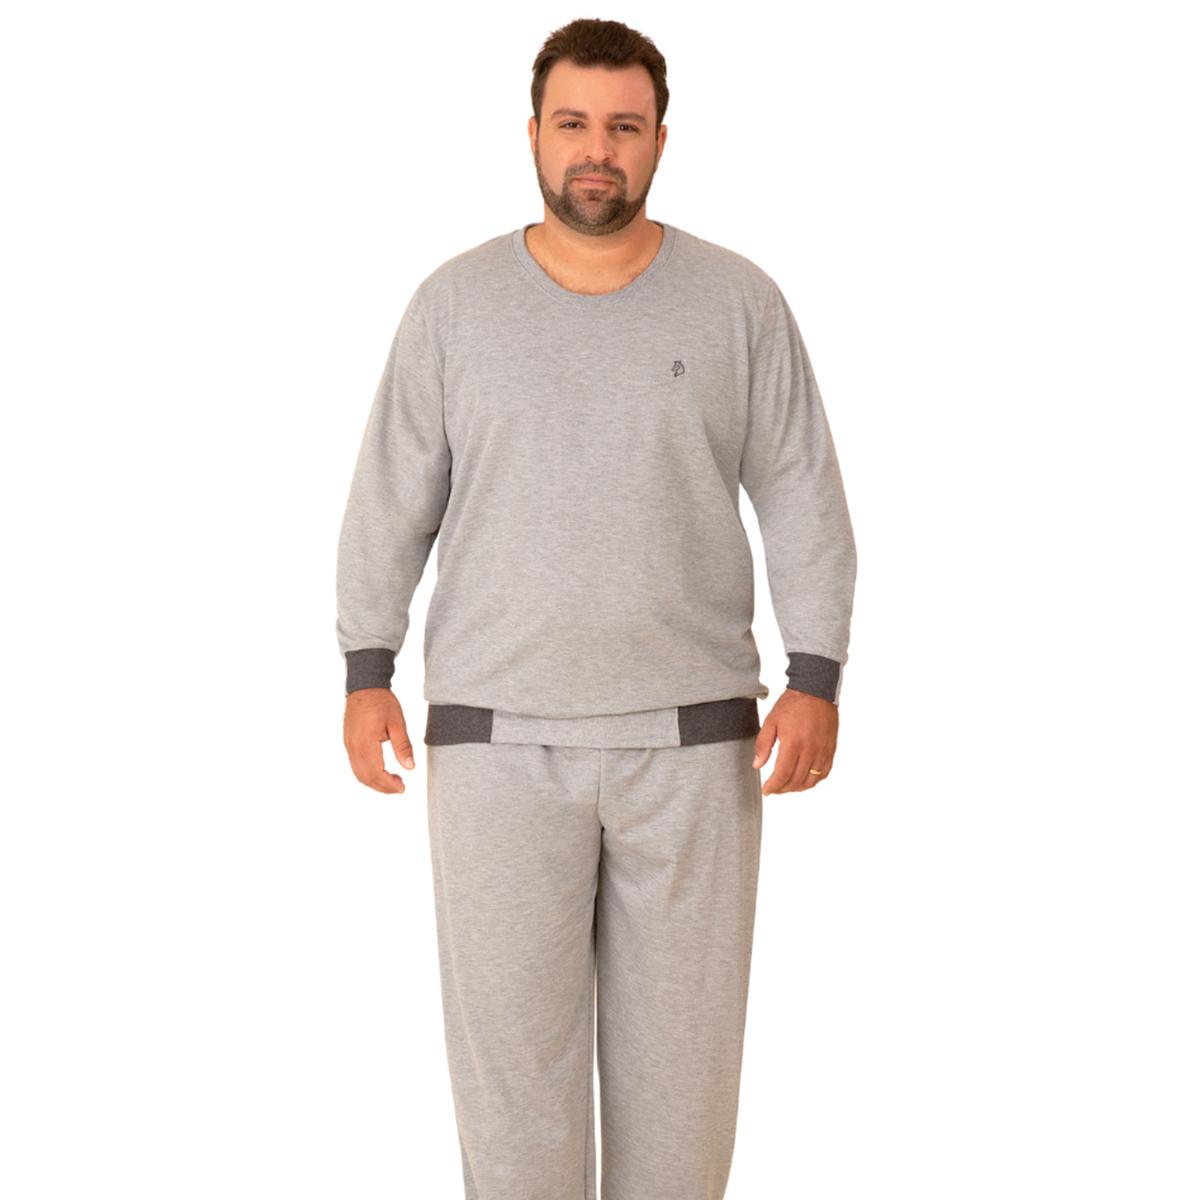 Pijama masculino plus size moletinho flanelado gola redonda